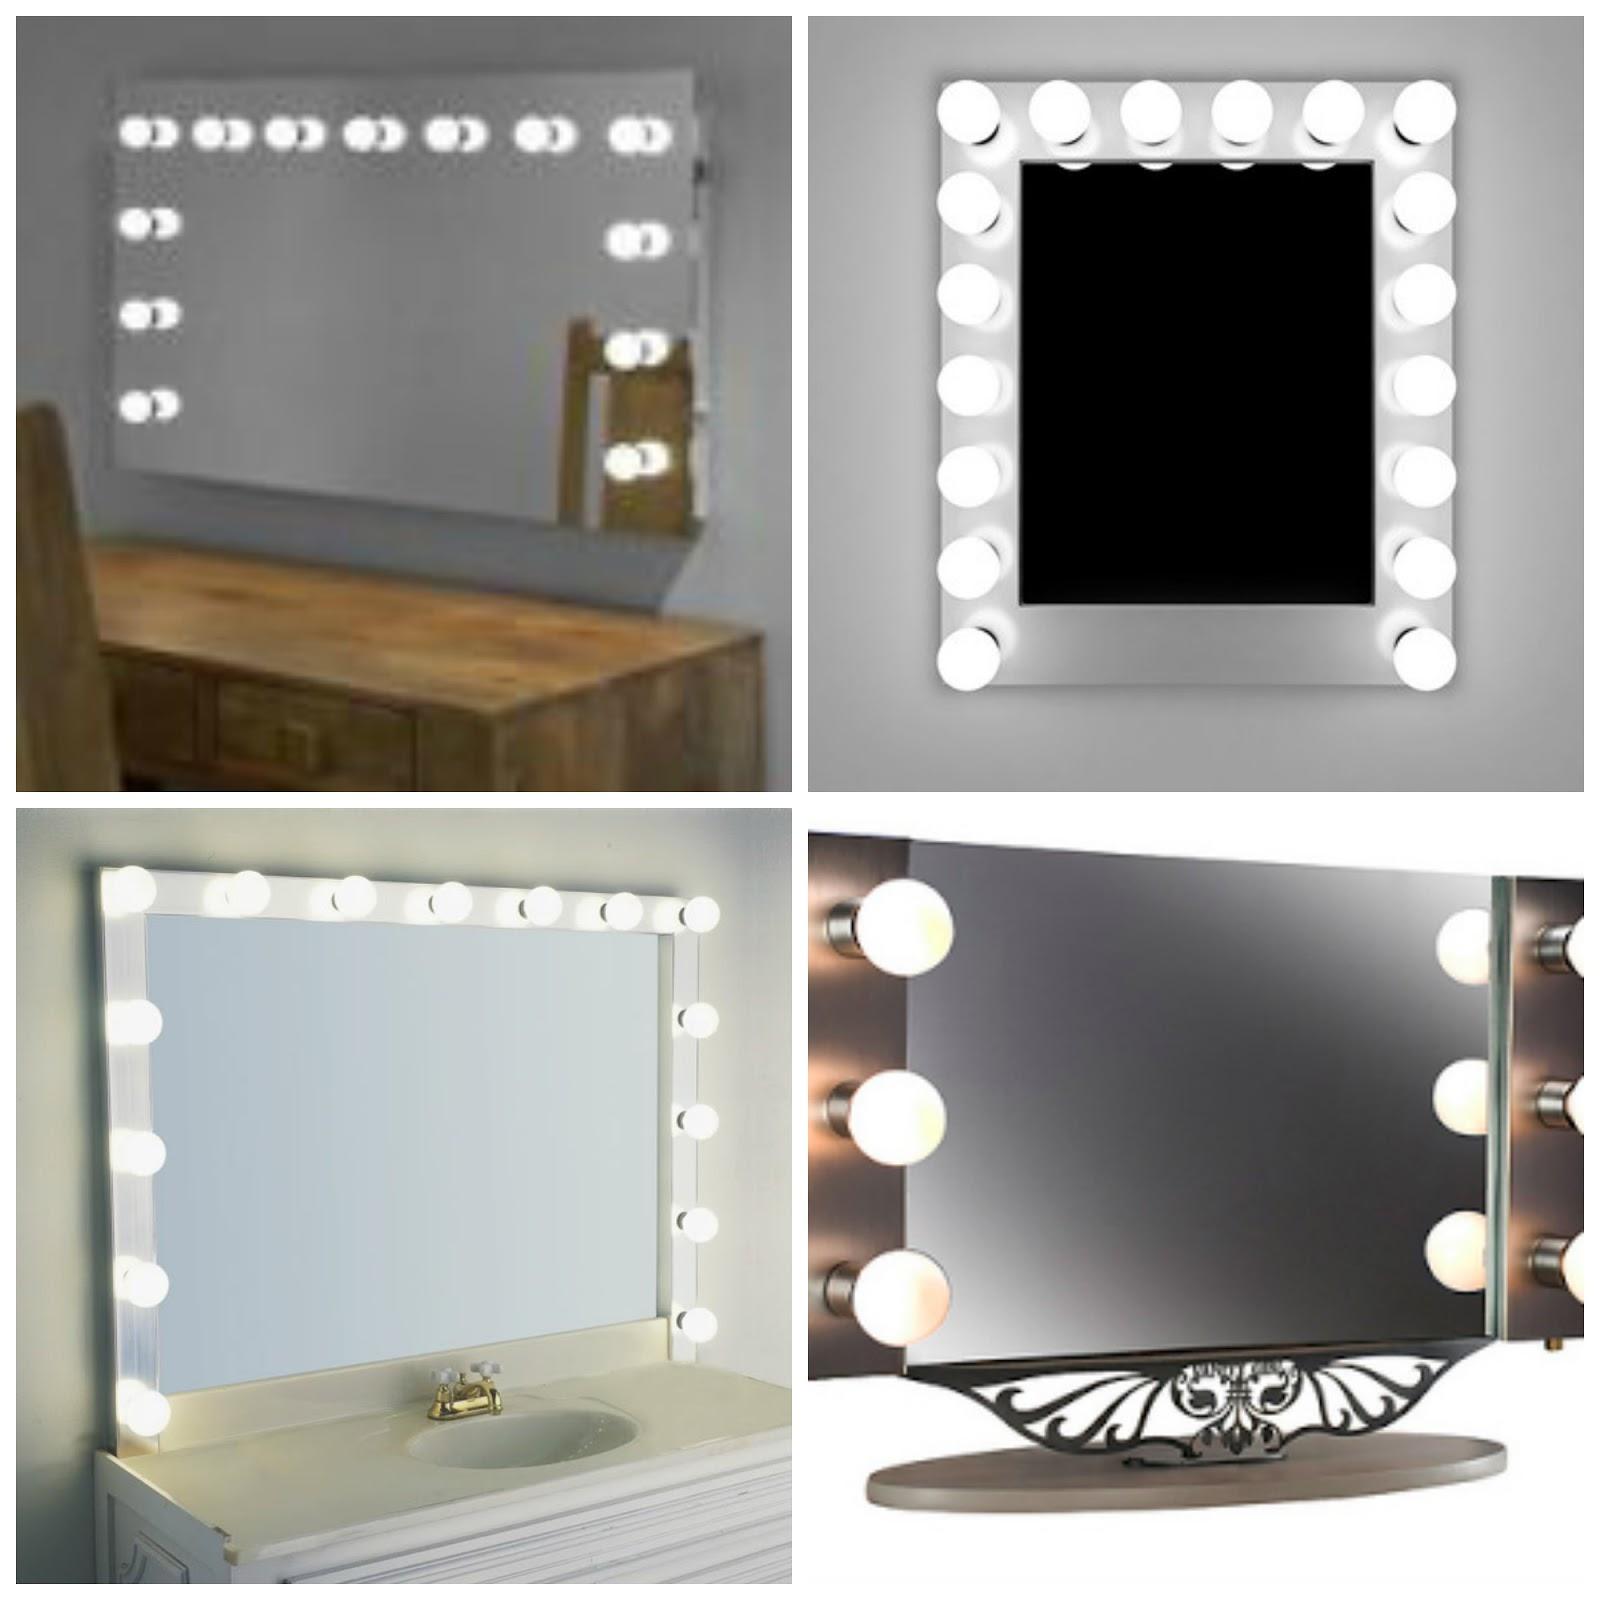 Wall Mounted Makeup Mirror With Lighted Canada Saubhaya Makeup